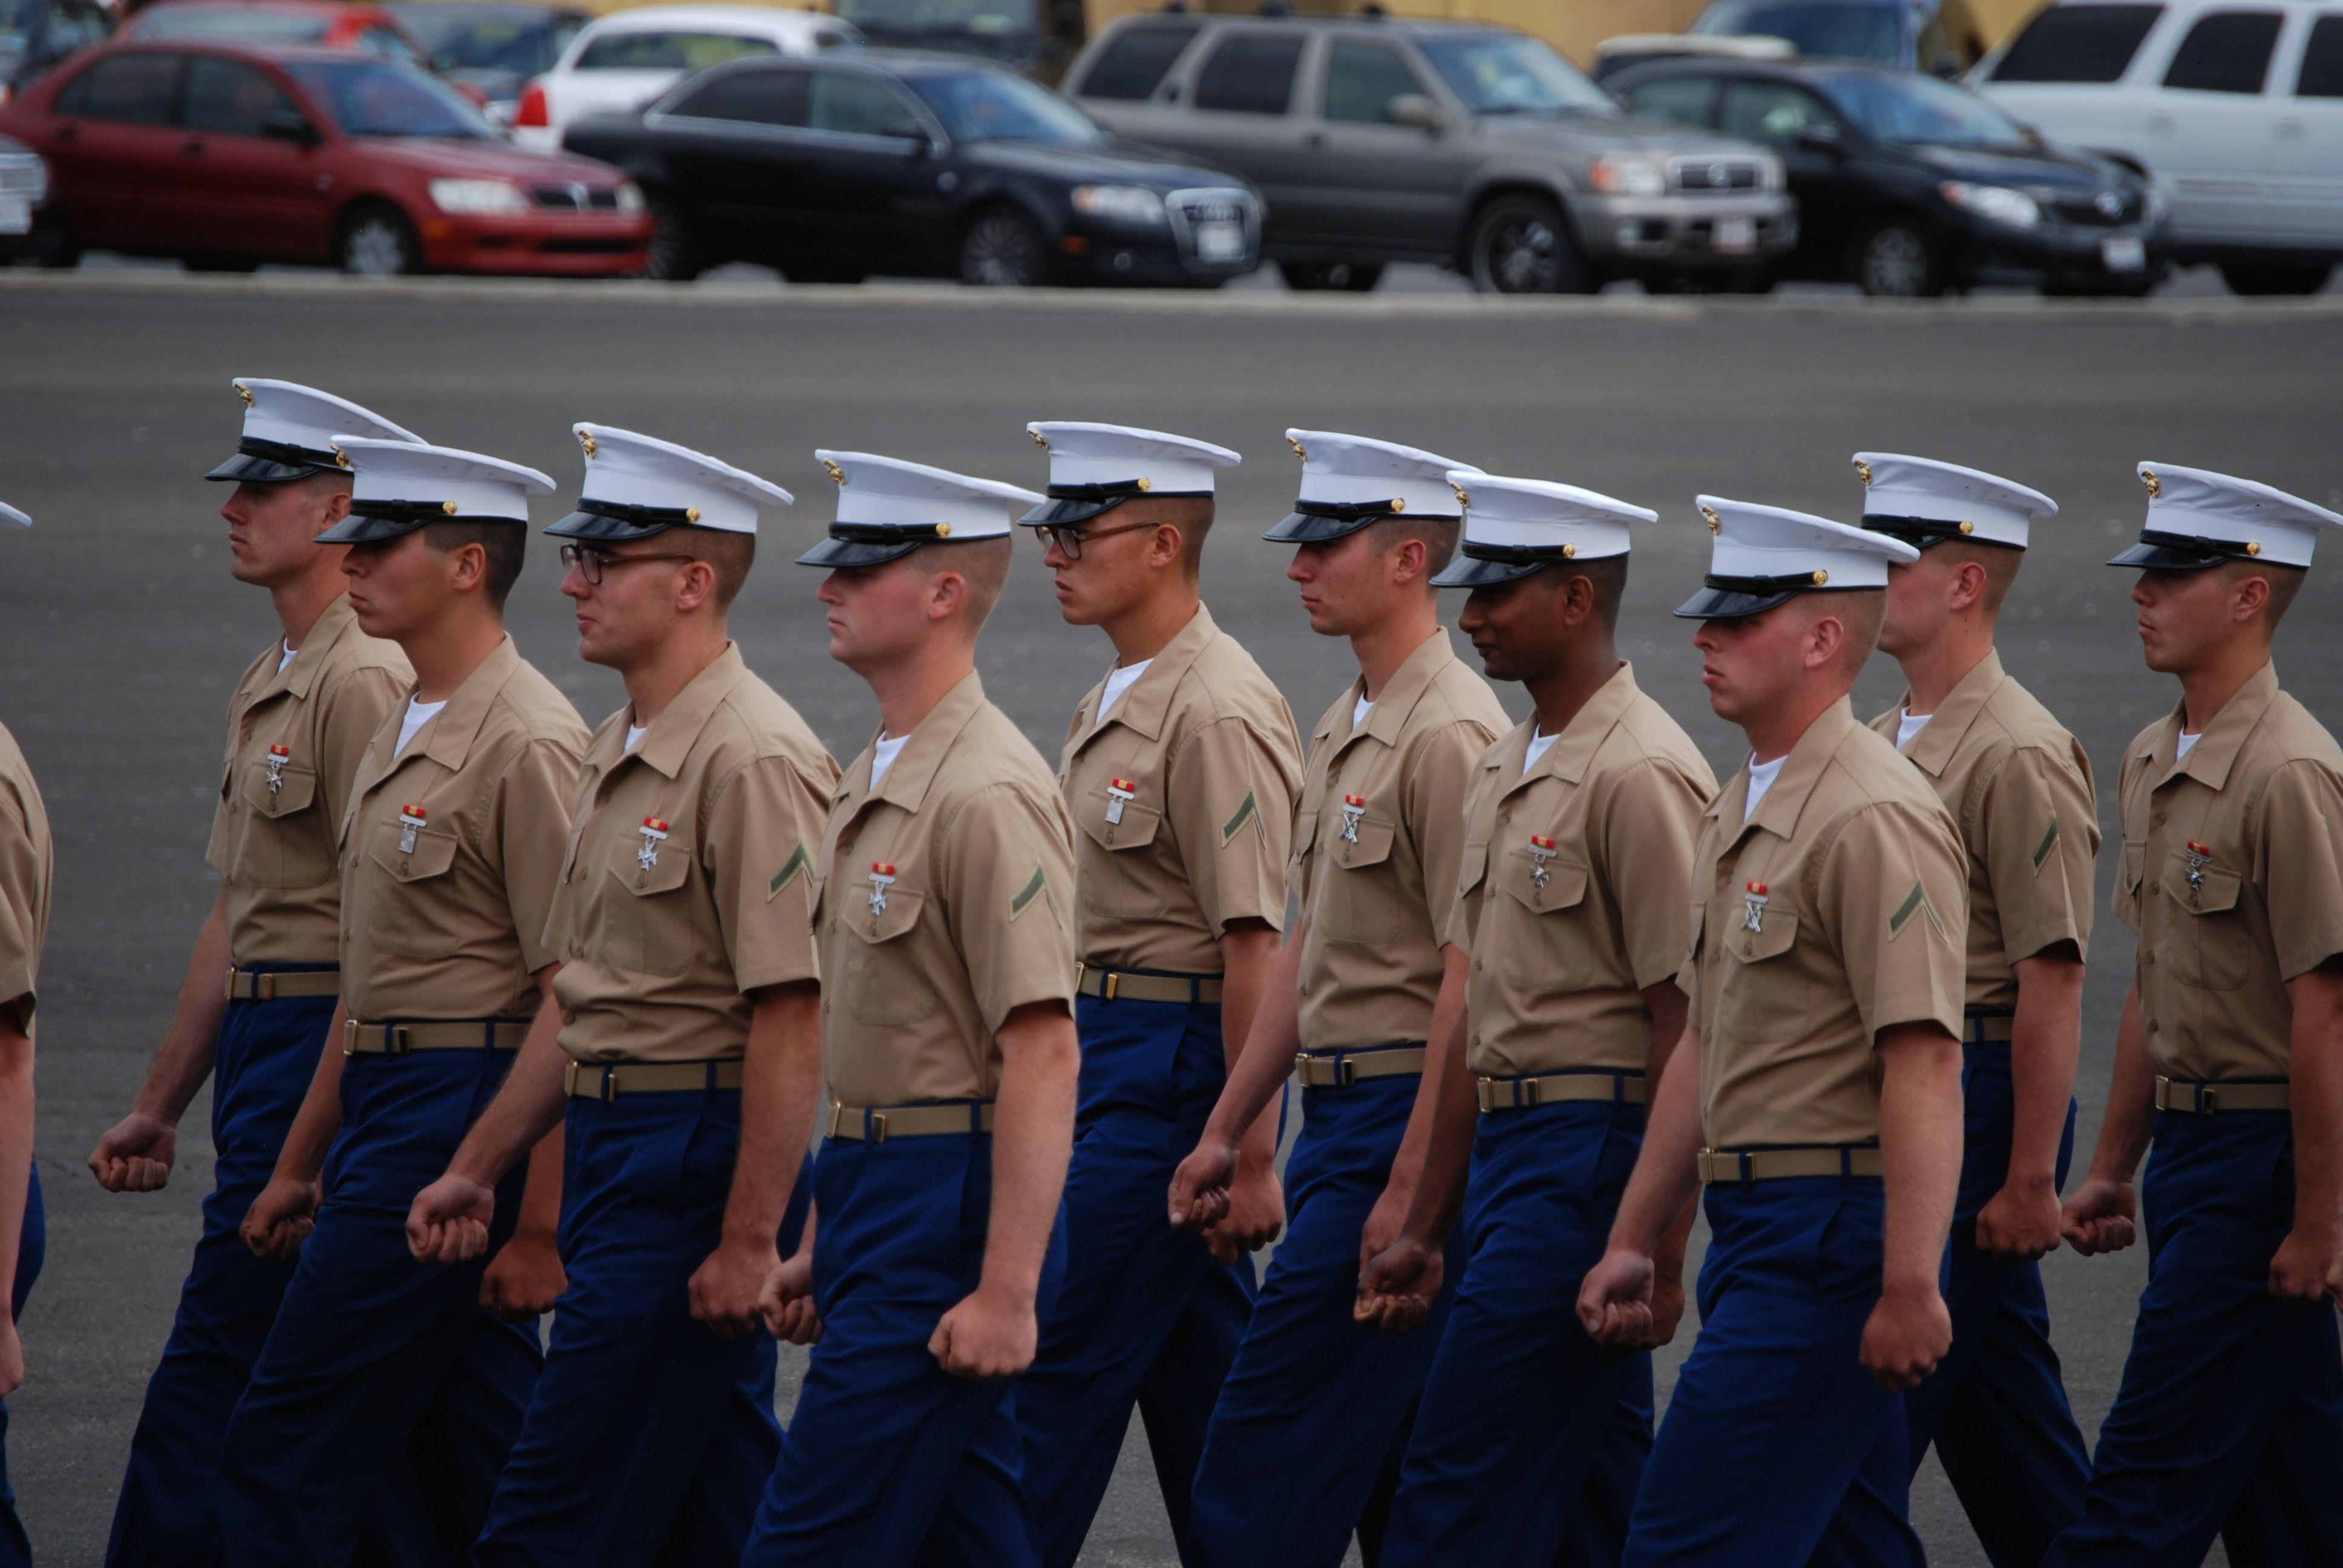 2011 MCRD Graduation - 3235 Kilo Co 3rd BN - San Diego, CA